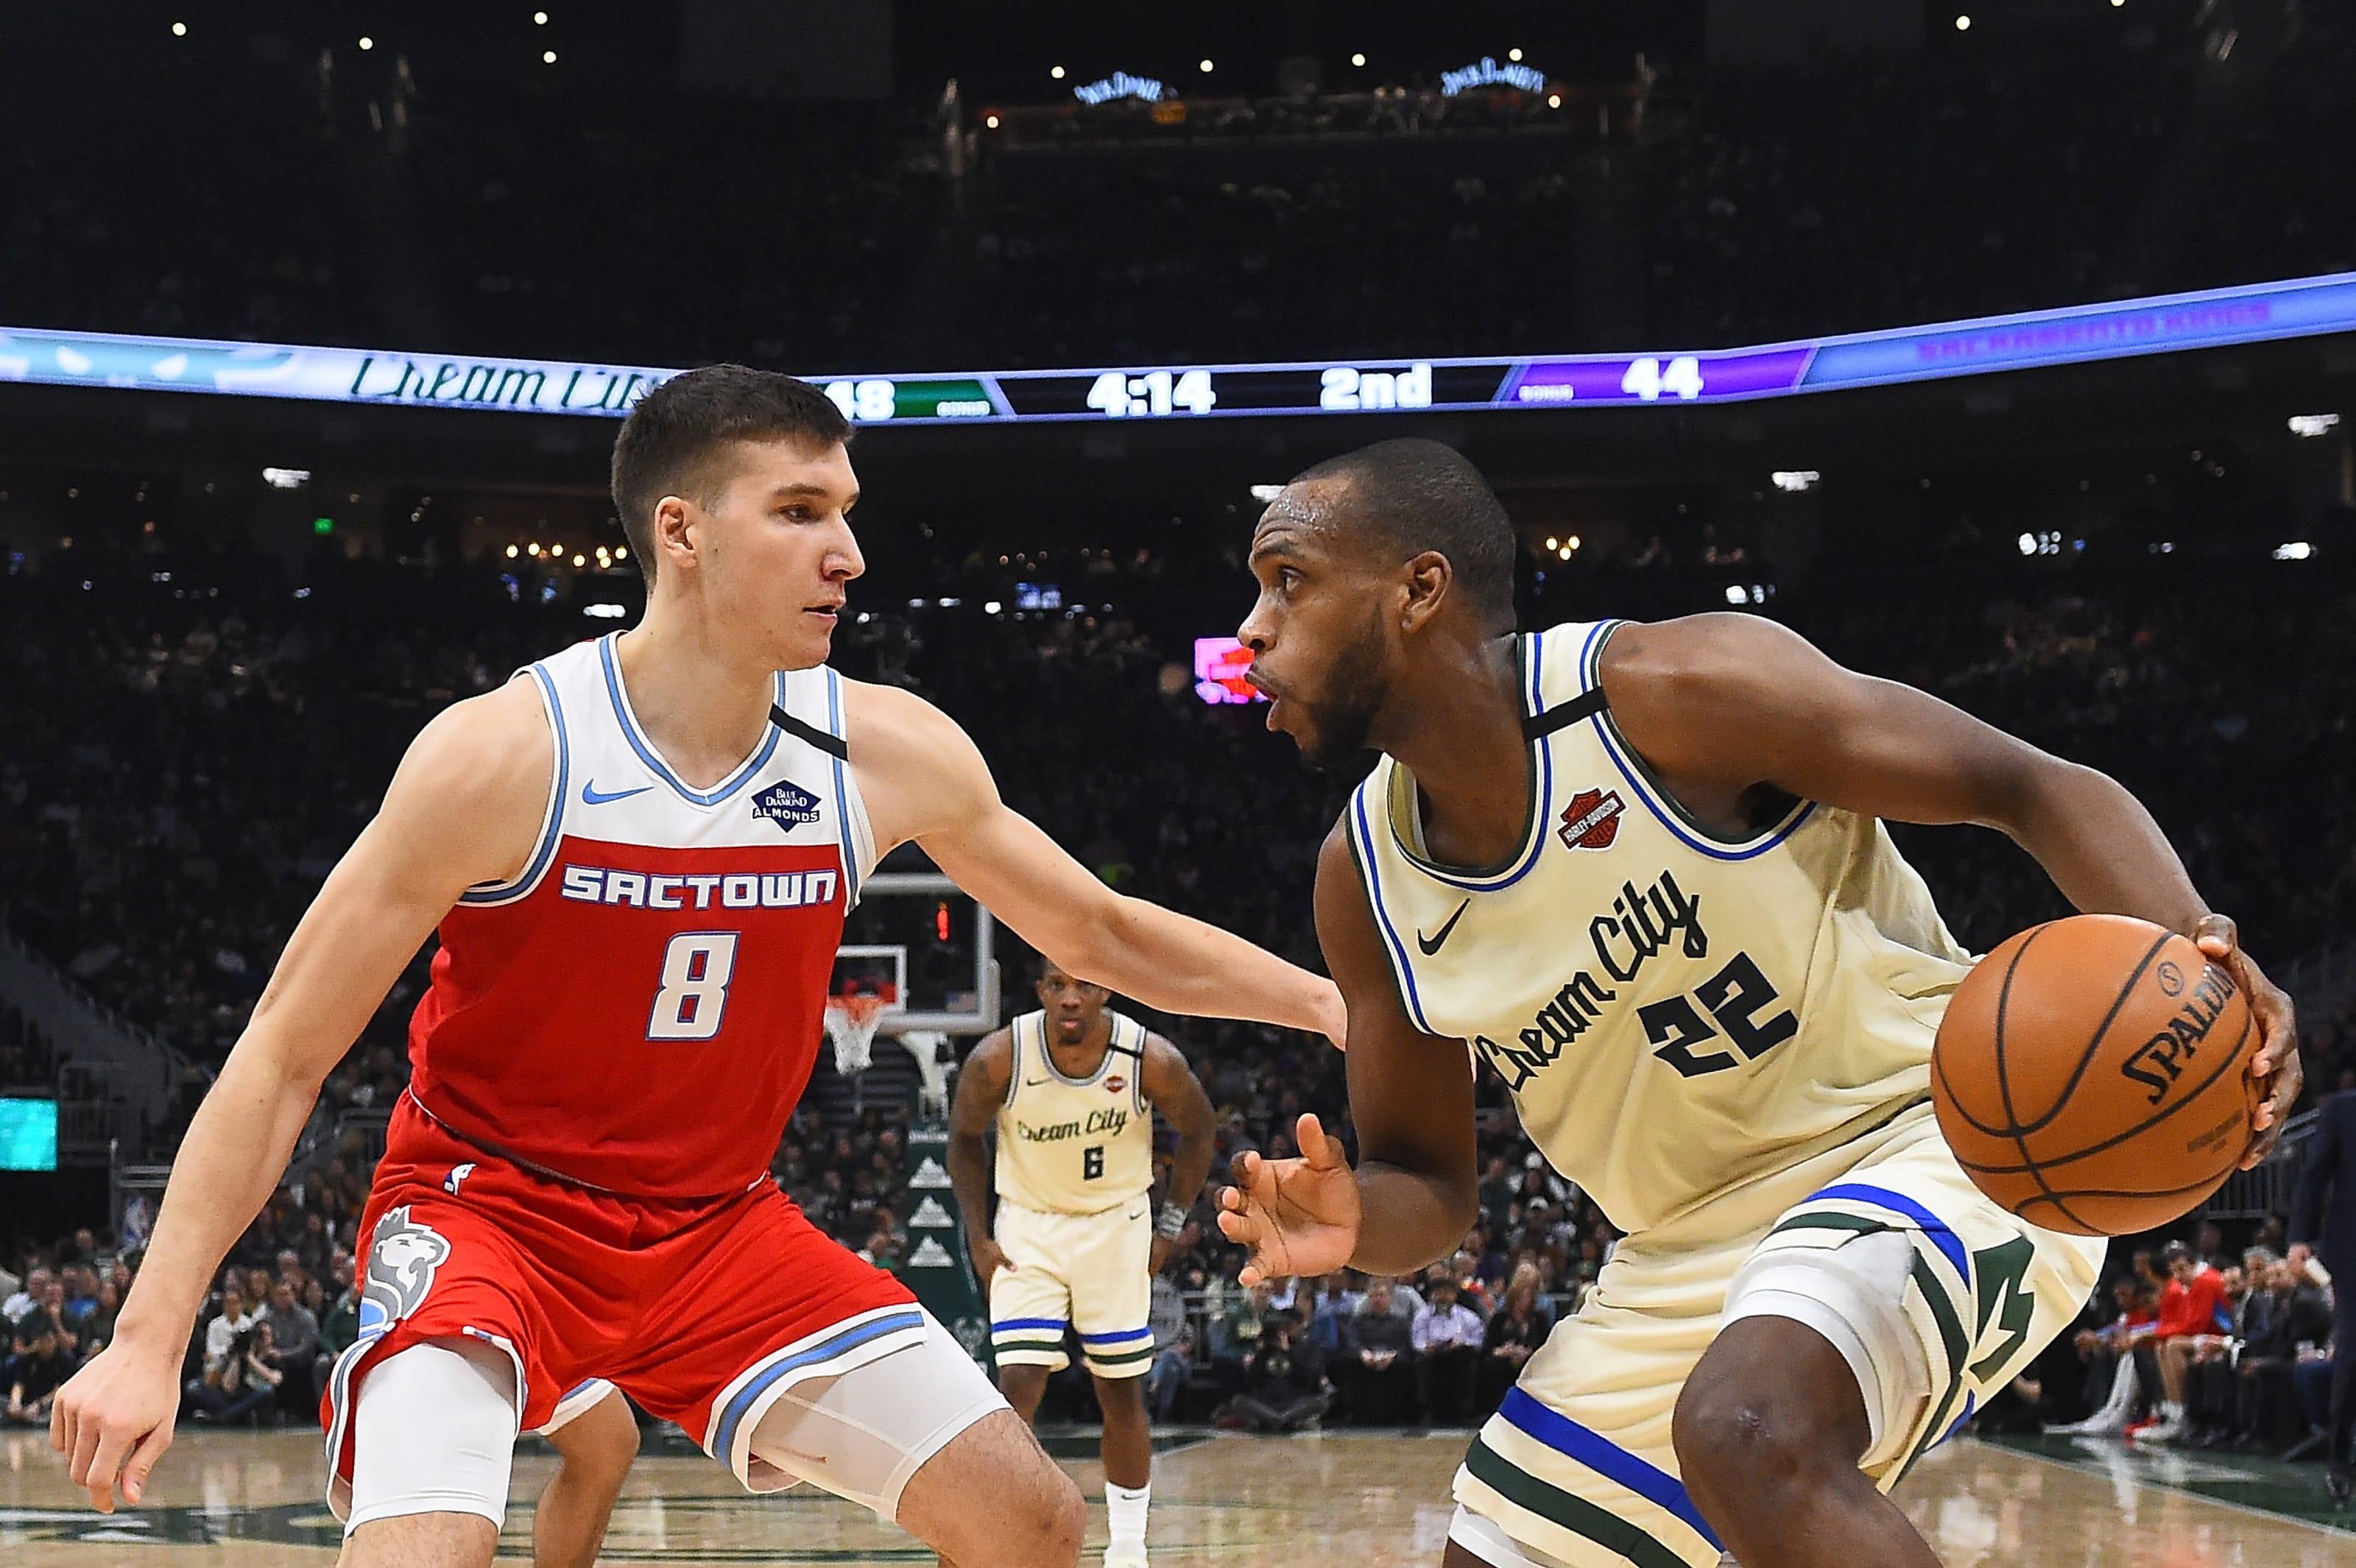 Milwaukee Bucks: Khris Middleton, Sacramento Kings: Bogdan Bogdanovic